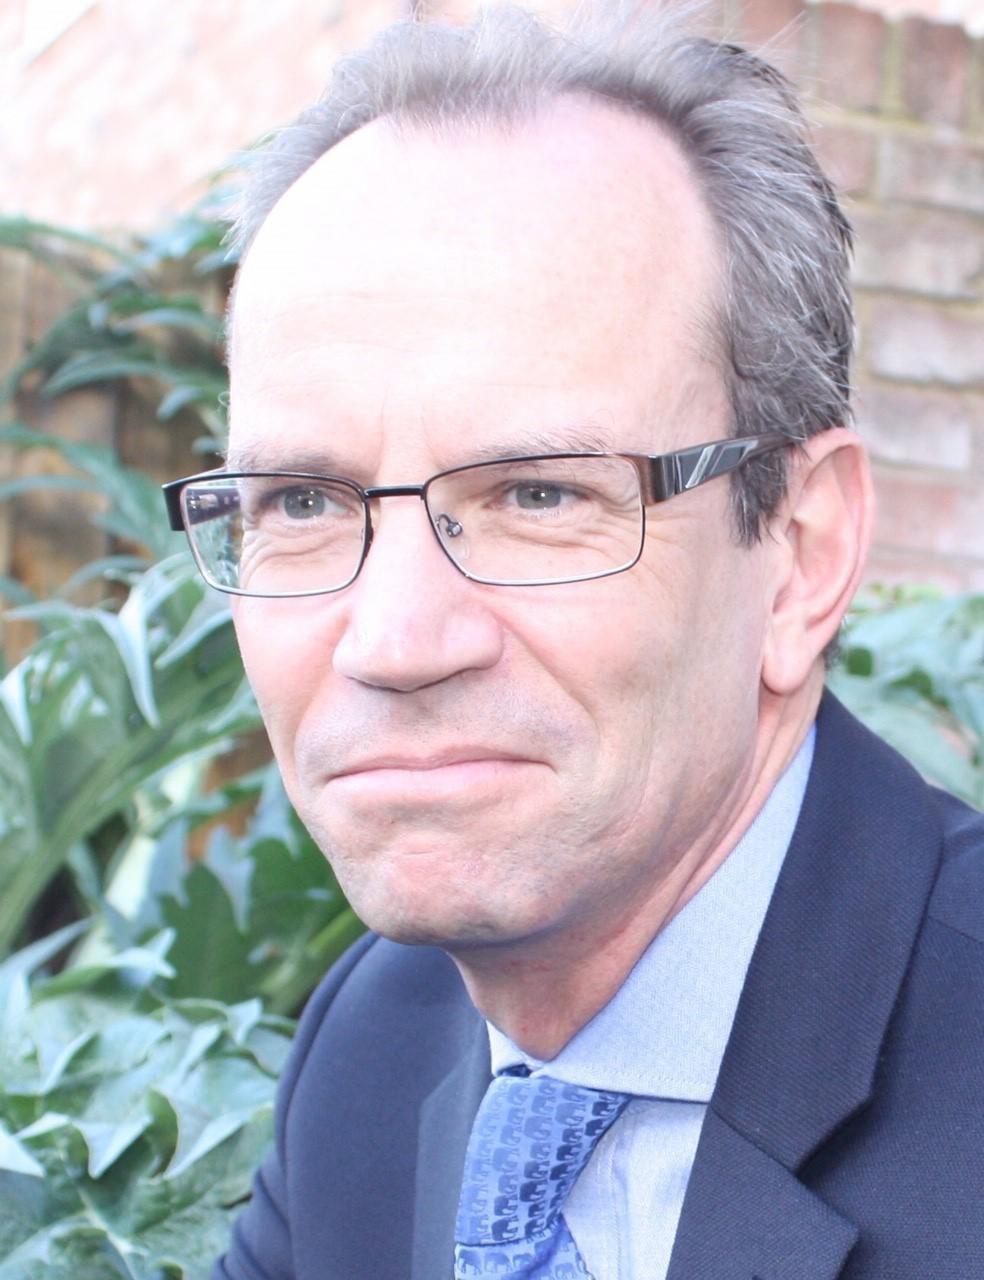 Paul Marsden CQP MCQI